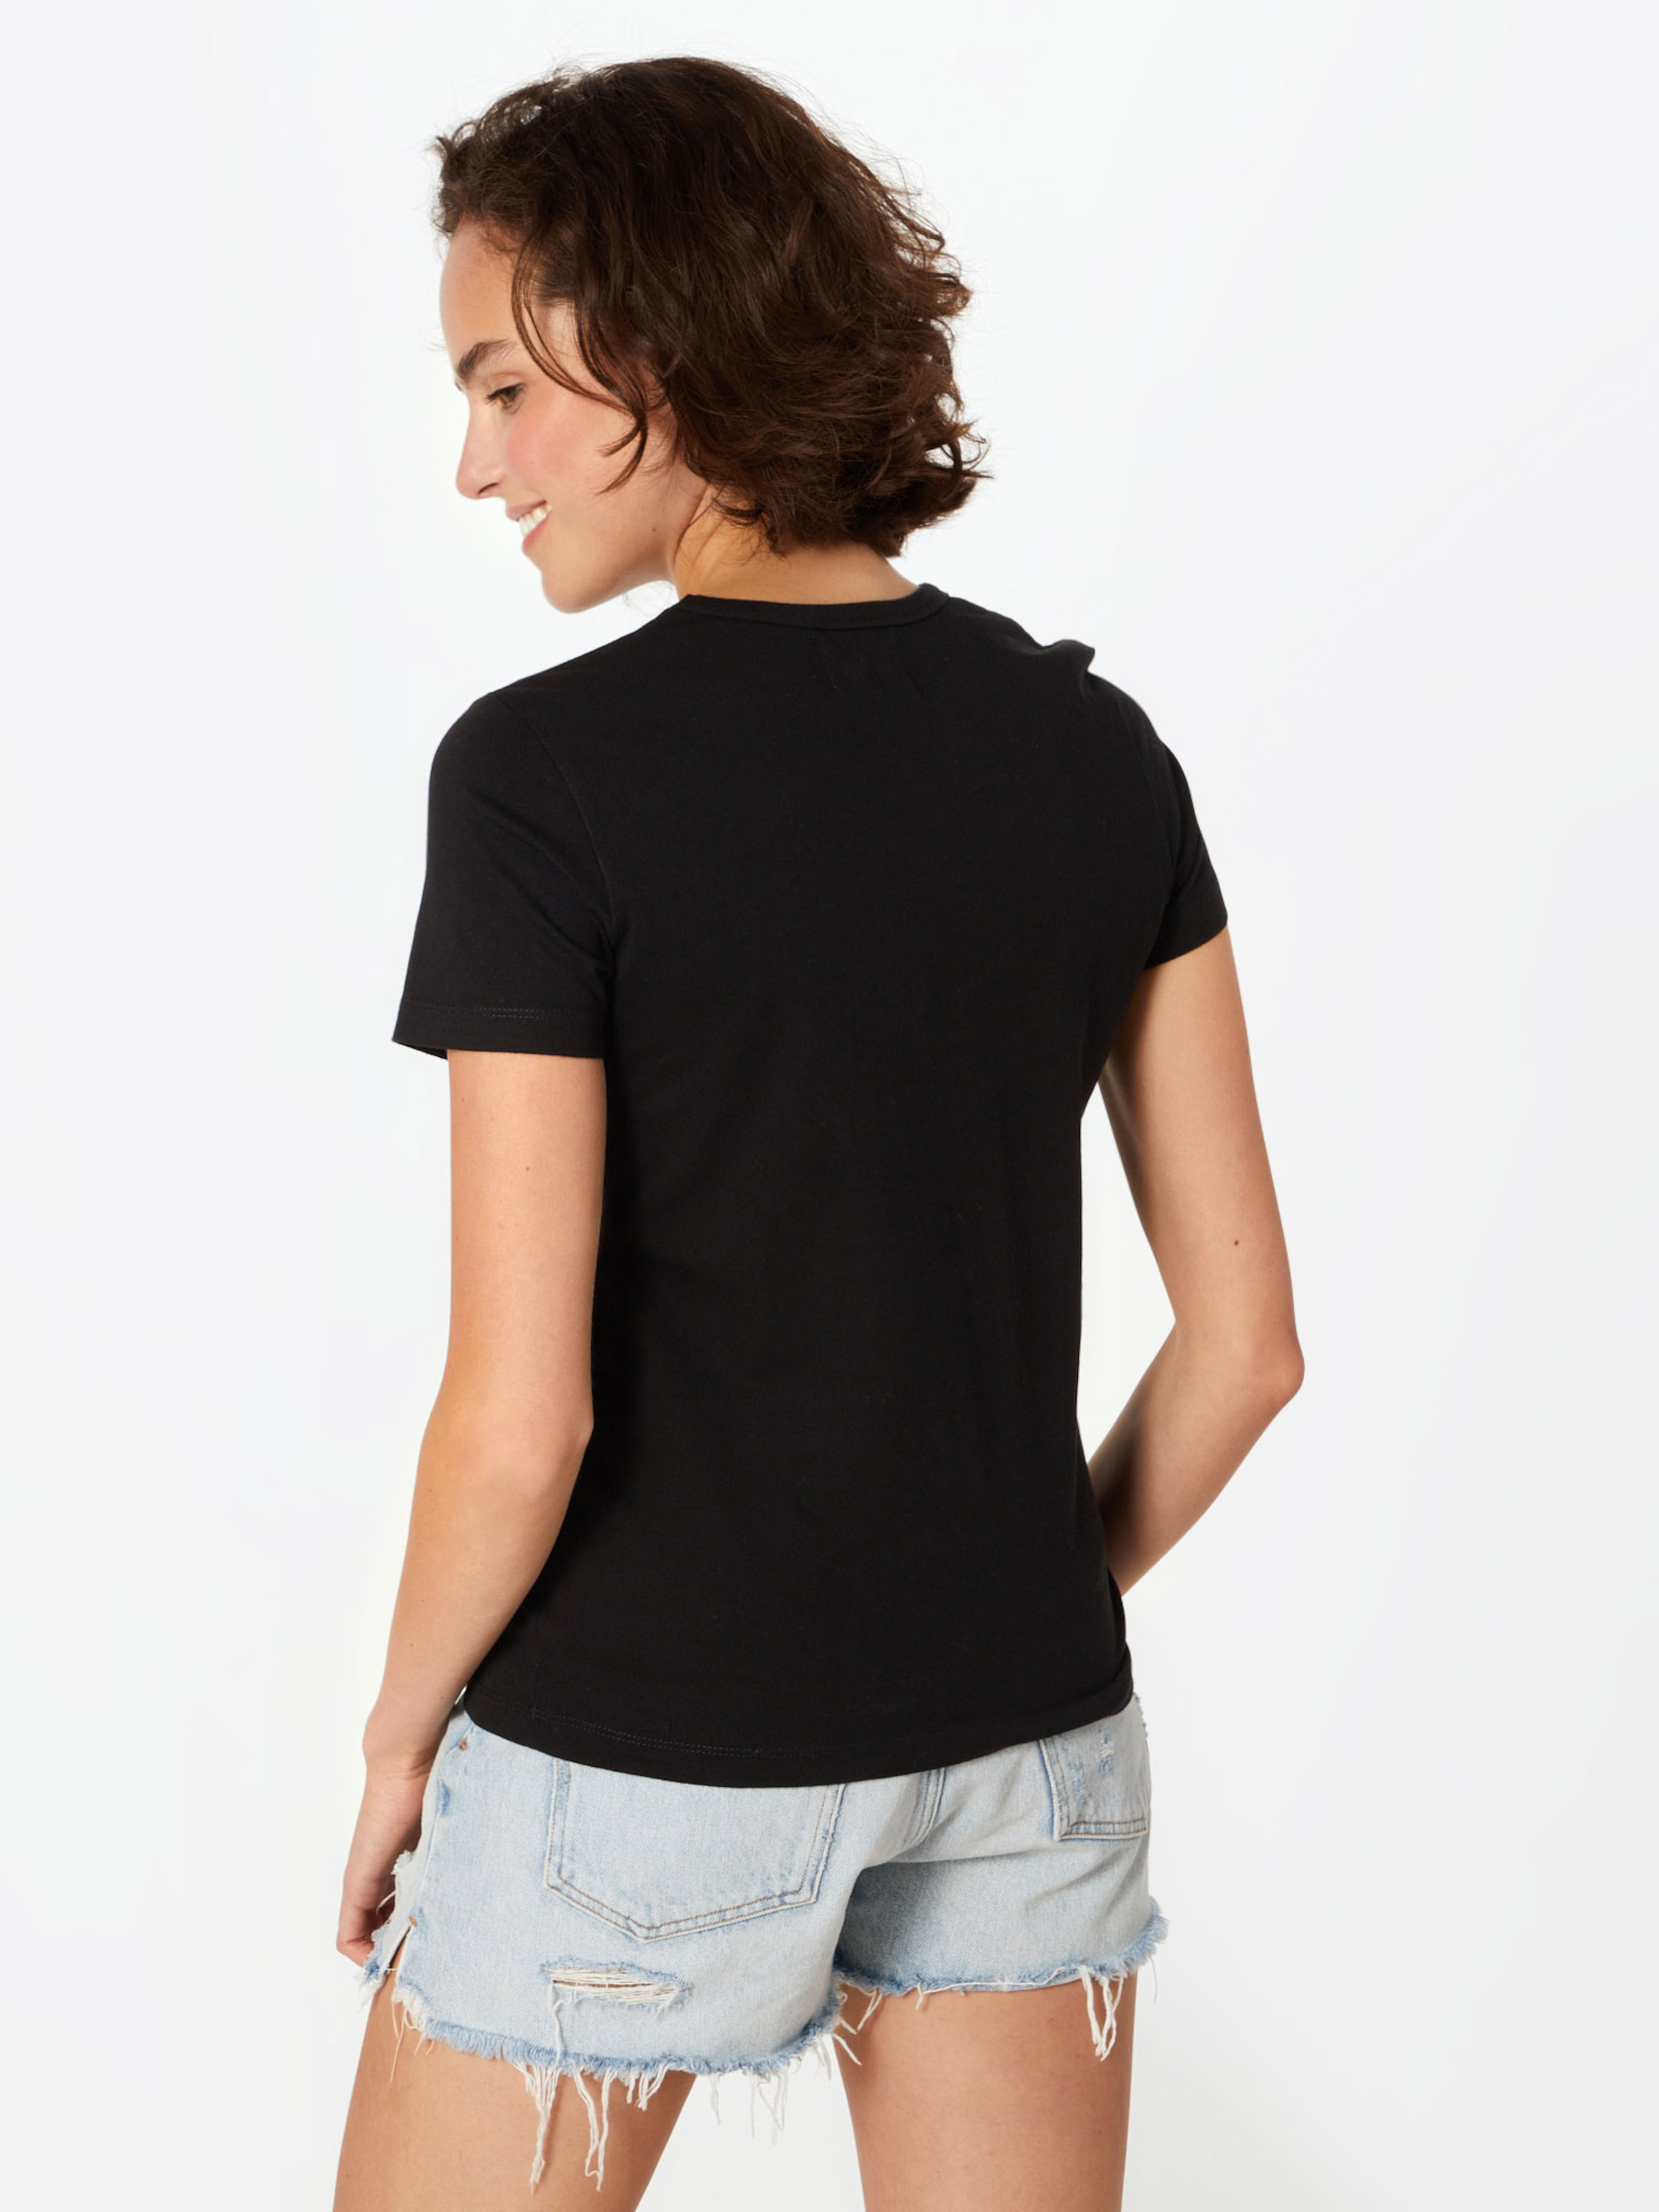 'uma' En NoirBlanc shirt T Wood MGjzSVpLqU